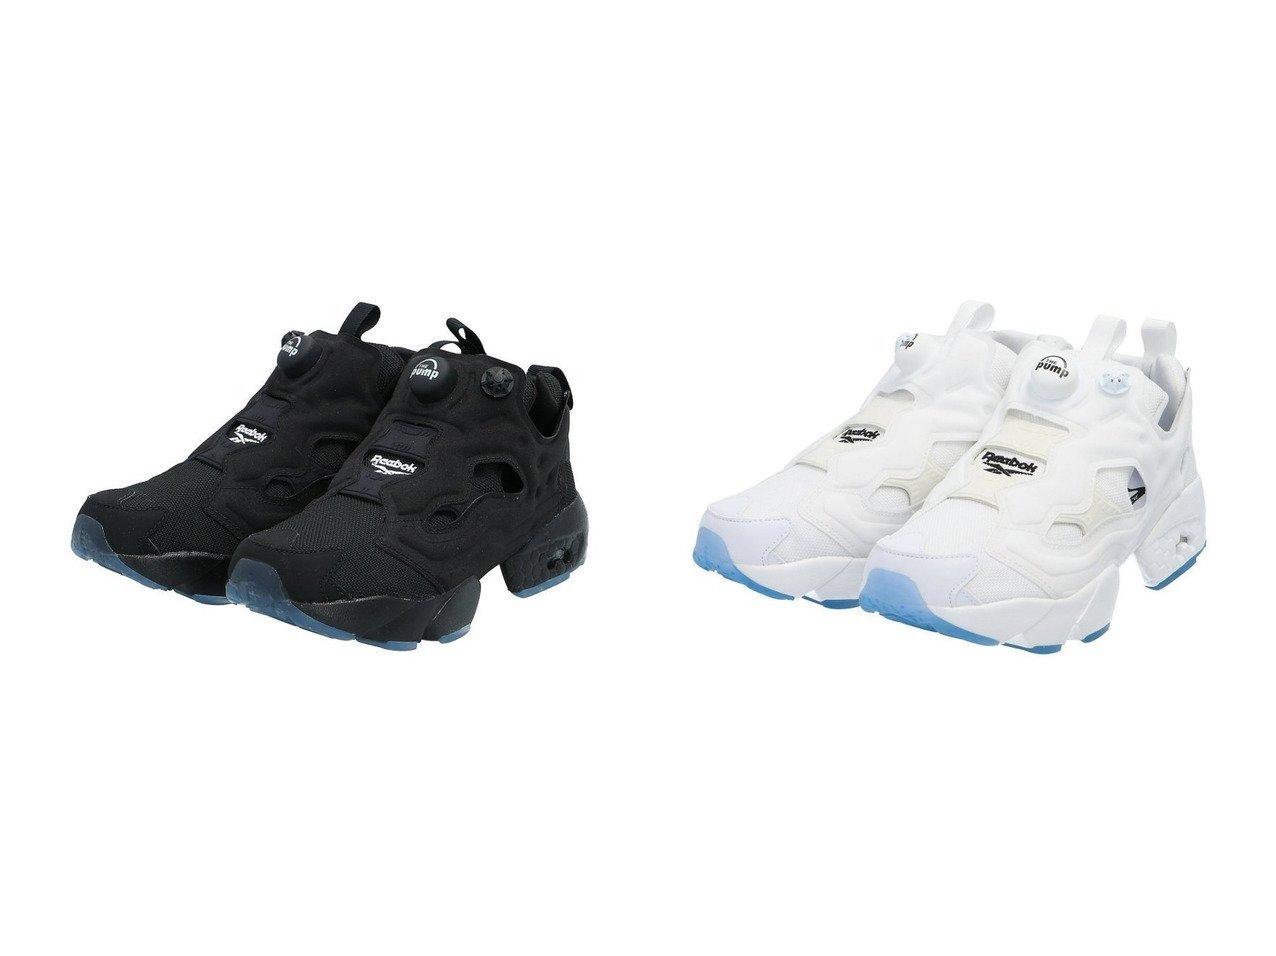 【Reebok CLASSIC/リーボック】のインスタポンプ フューリー Instapump Fury OG Shoes リーボック GW4817 GW4818 【シューズ・靴】おすすめ!人気、トレンド・レディースファッションの通販   おすすめで人気の流行・トレンド、ファッションの通販商品 メンズファッション・キッズファッション・インテリア・家具・レディースファッション・服の通販 founy(ファニー) https://founy.com/ ファッション Fashion レディースファッション WOMEN NEW・新作・新着・新入荷 New Arrivals クール シューズ スニーカー スリッポン フィット 軽量 |ID:crp329100000026888